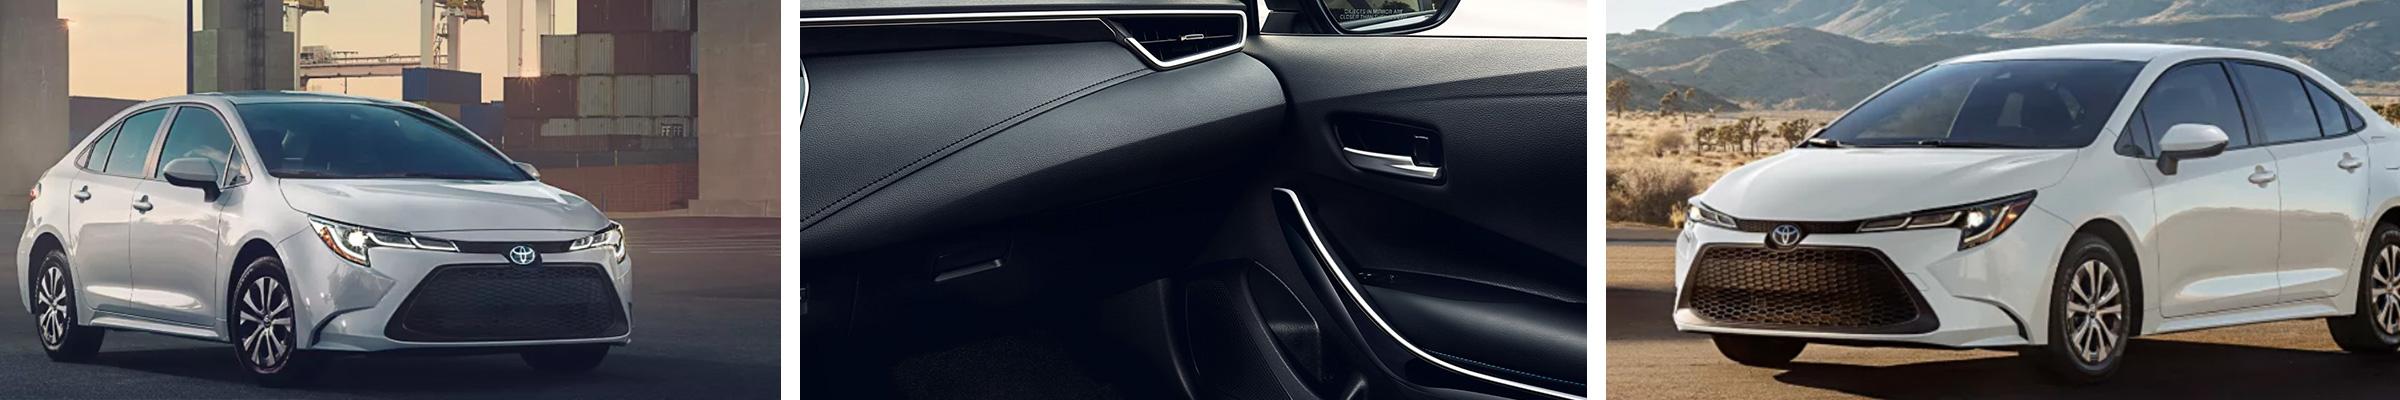 2022 Toyota Corolla Hybrid For Sale St. Augustine FL   Jacksonville